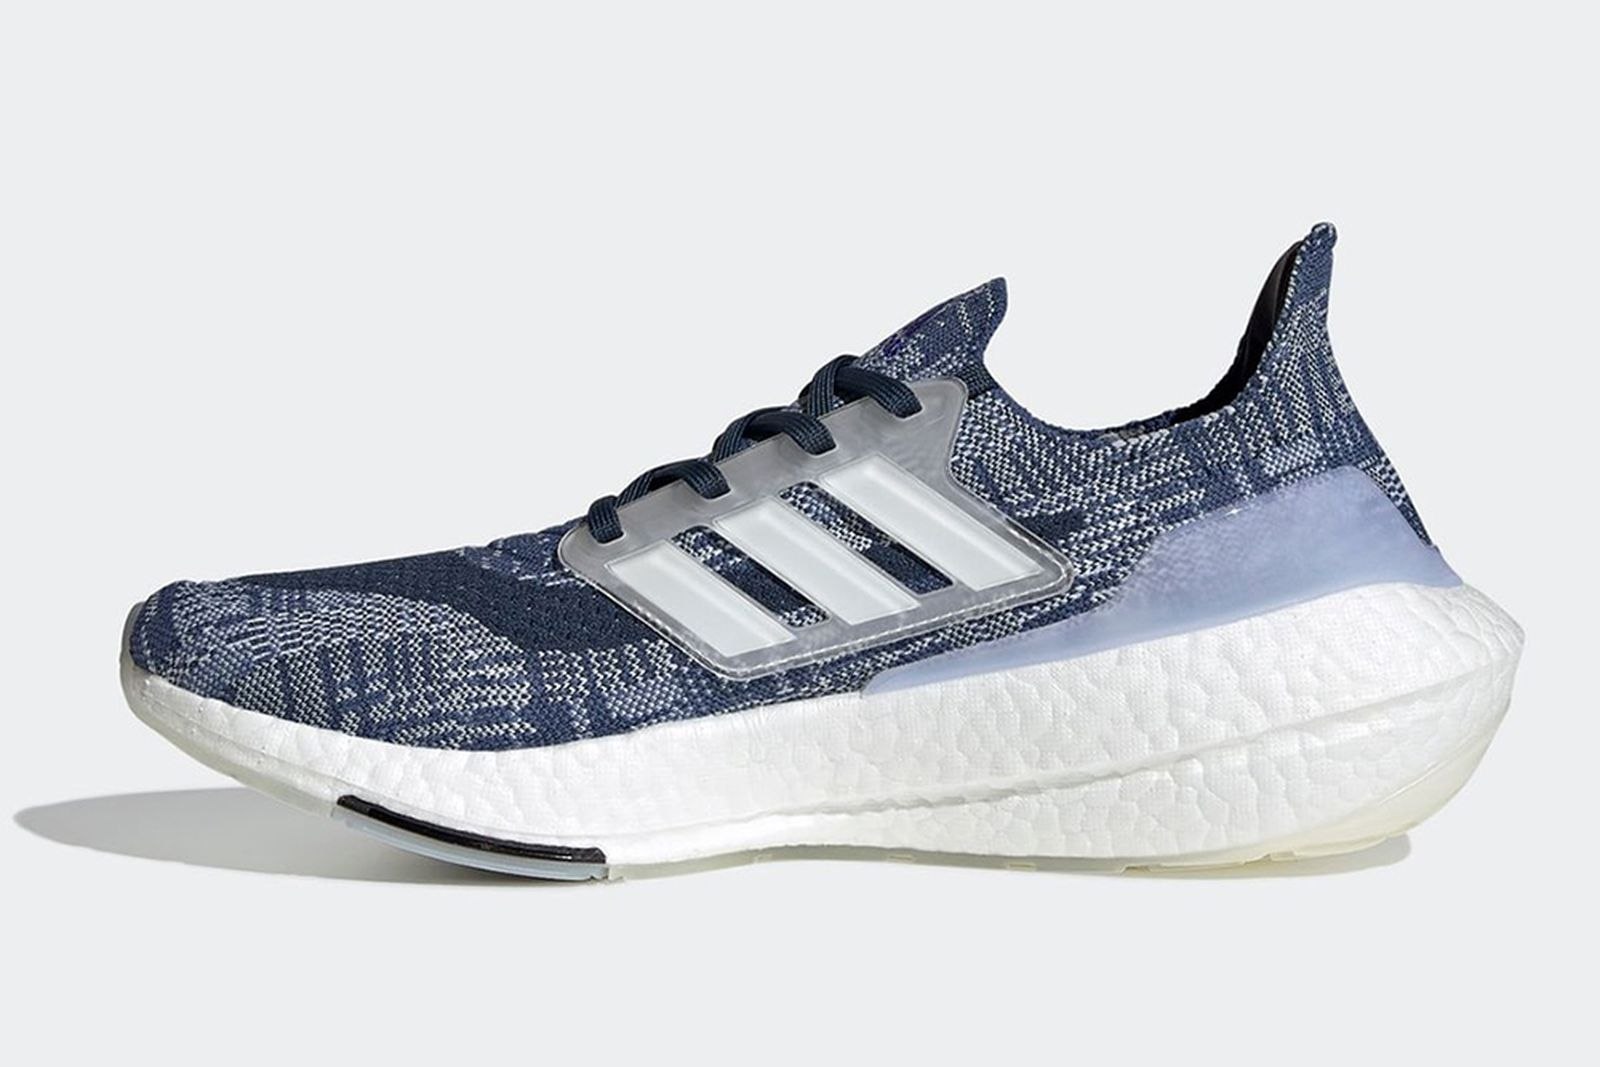 sneaker-news-1-02-22-2021-05